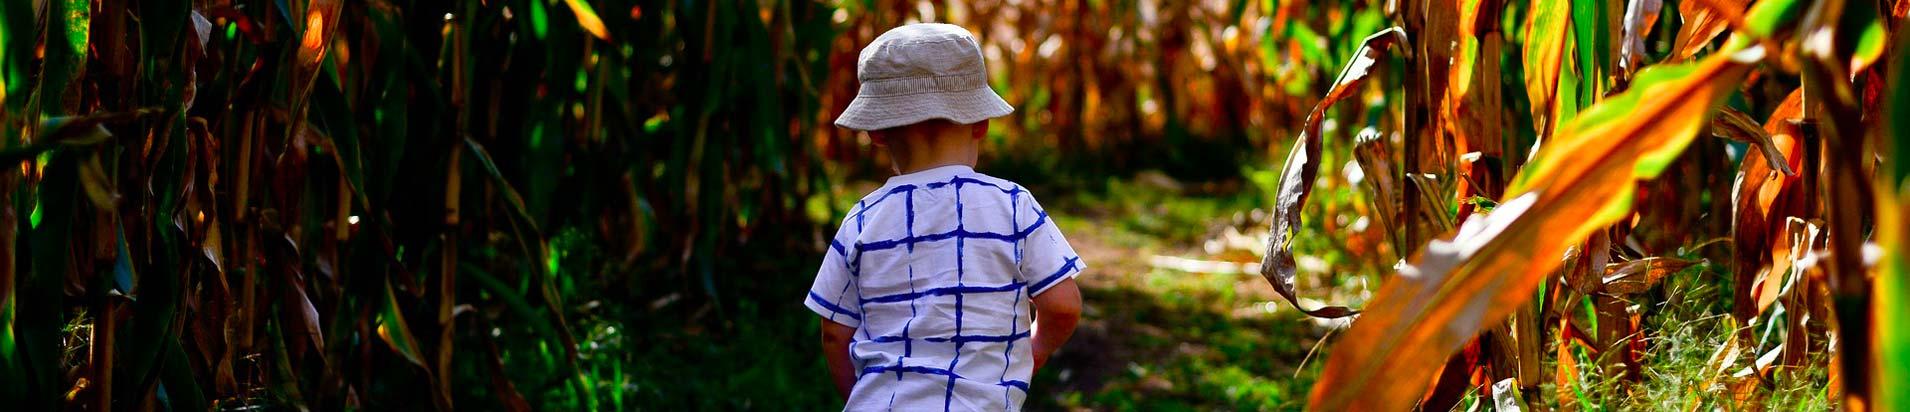 labyrinthe maïs landes